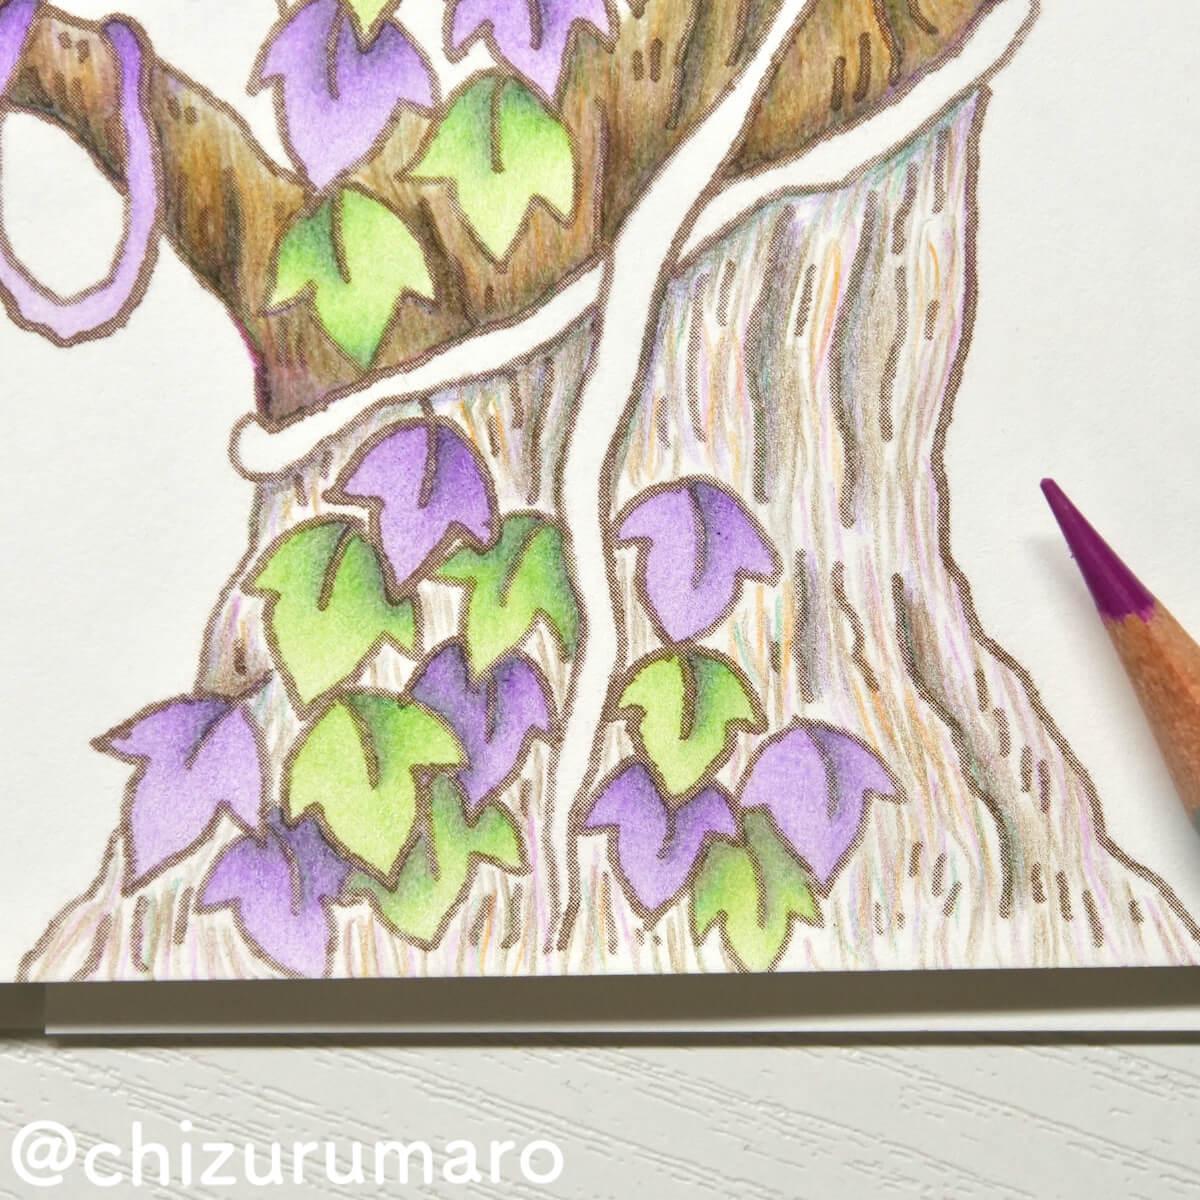 f:id:chizurumaro:20201203205545j:plain